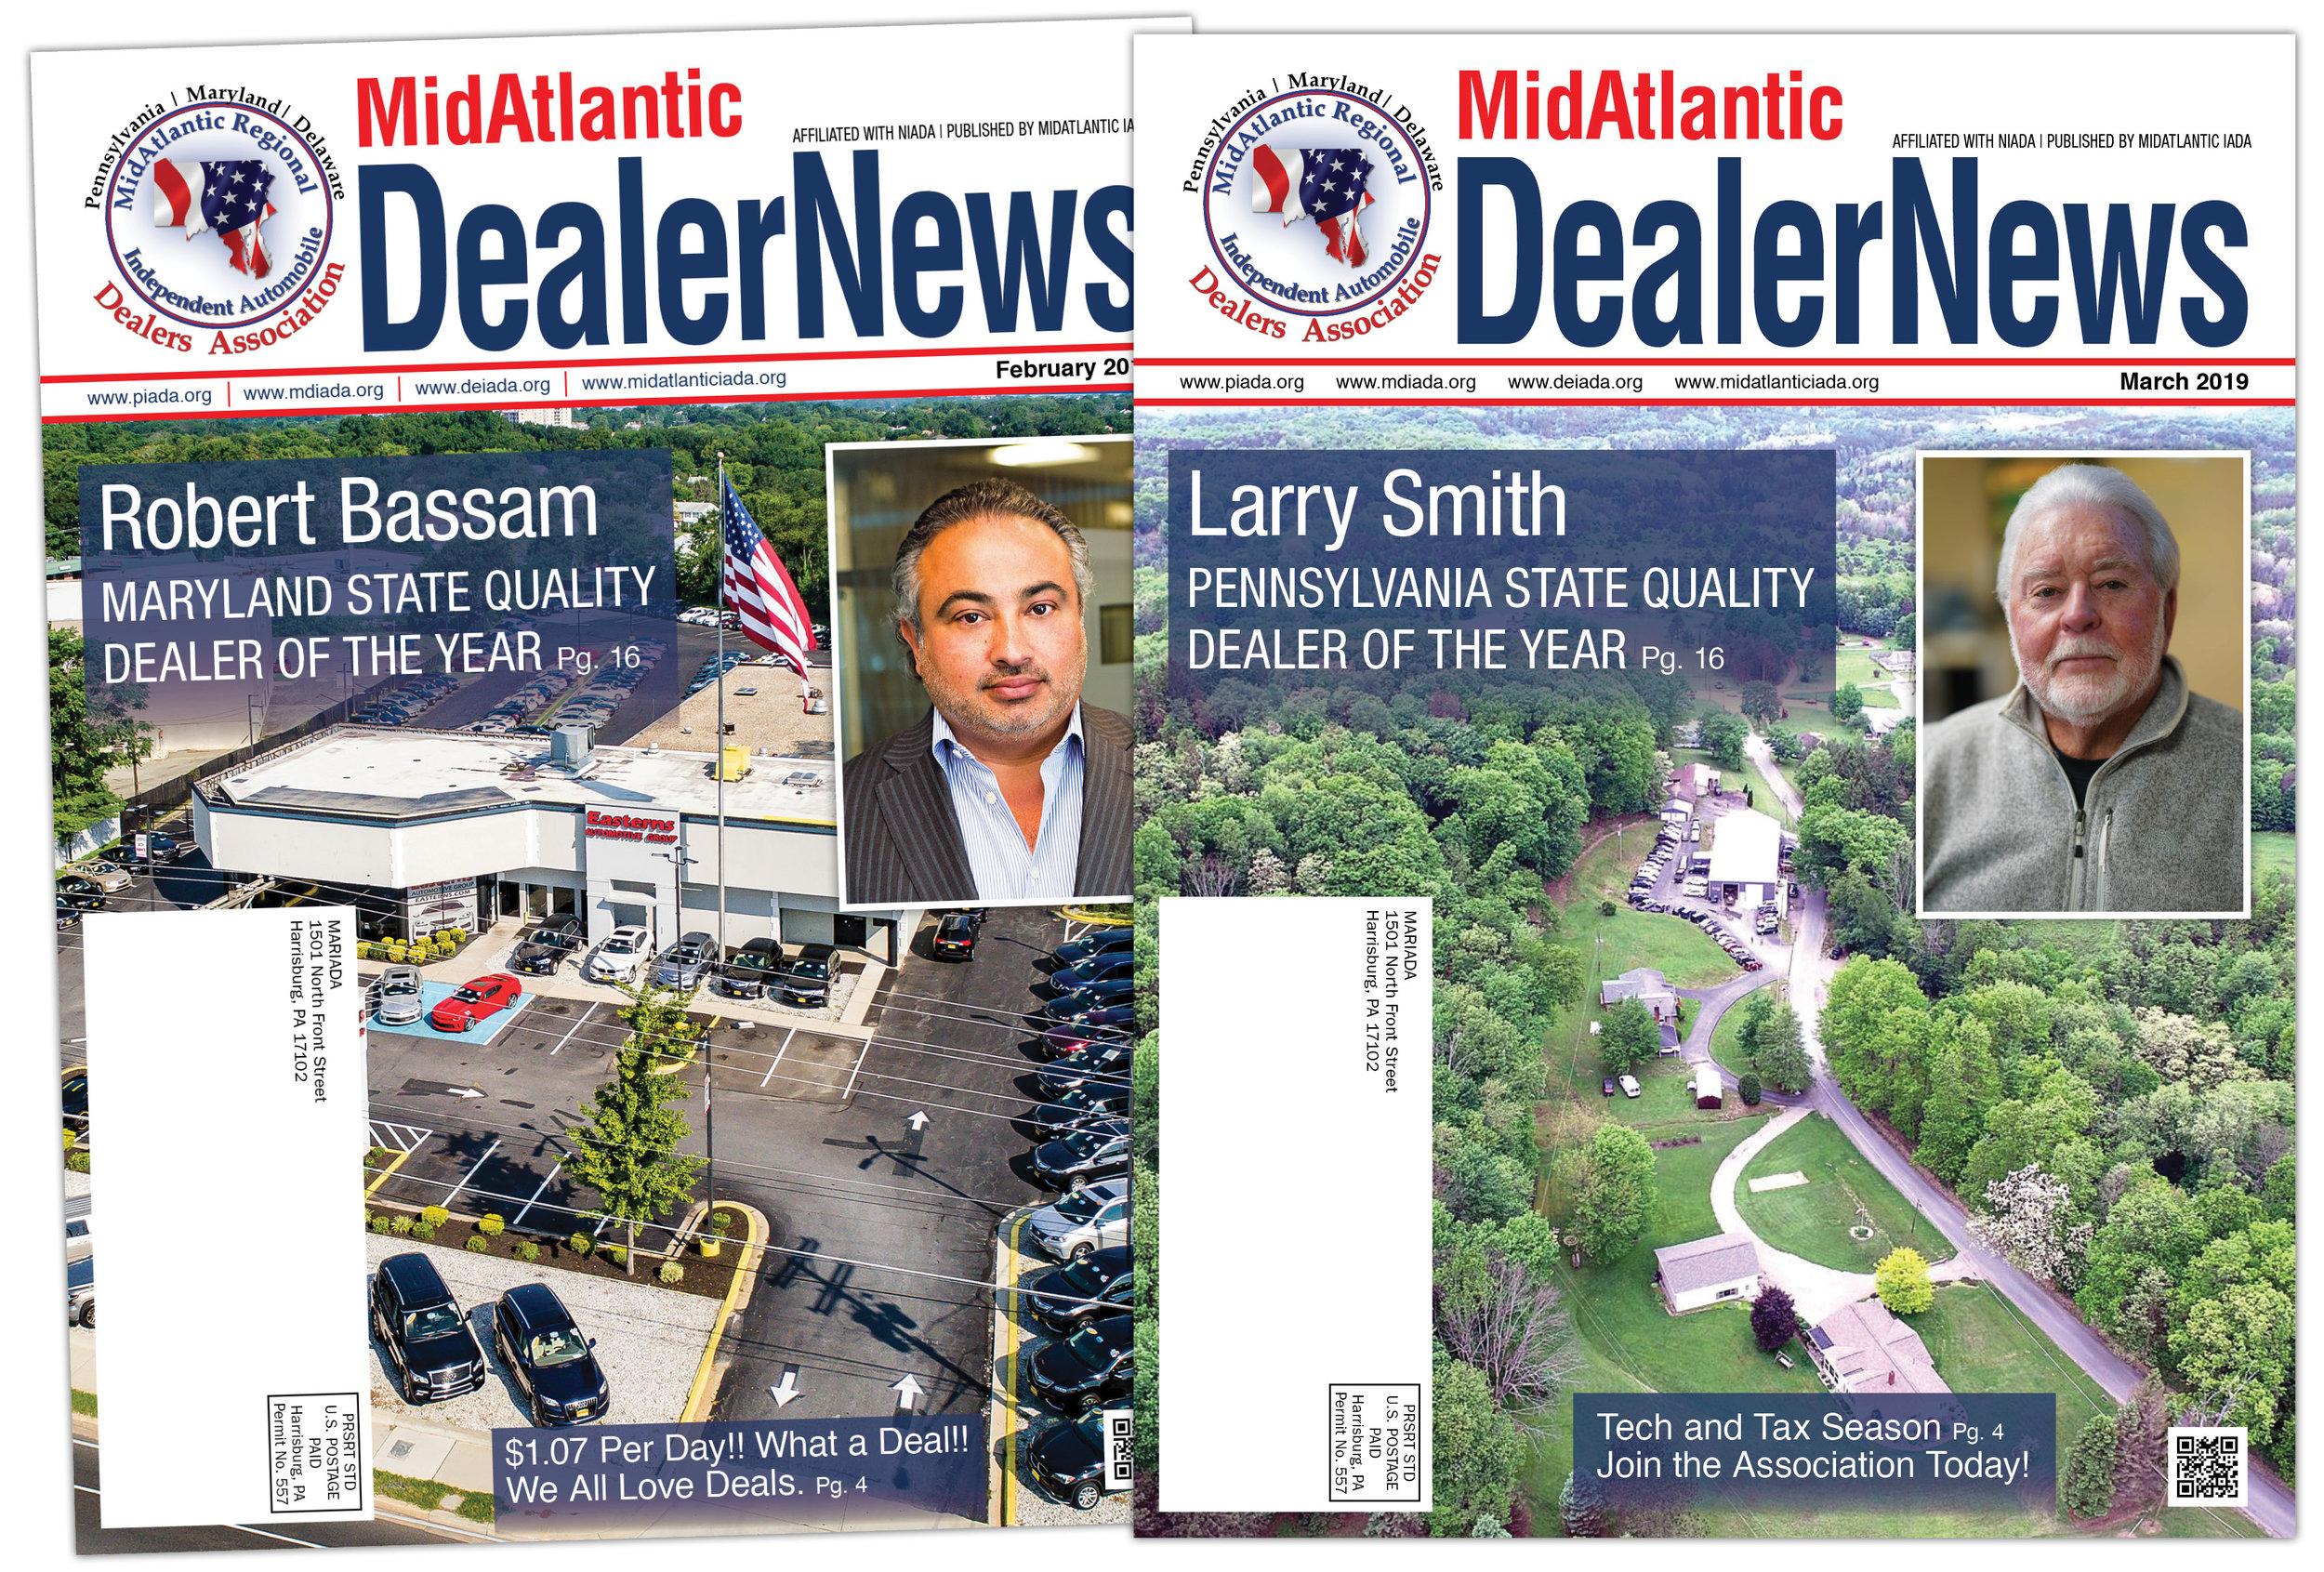 DealerNews covers.jpg